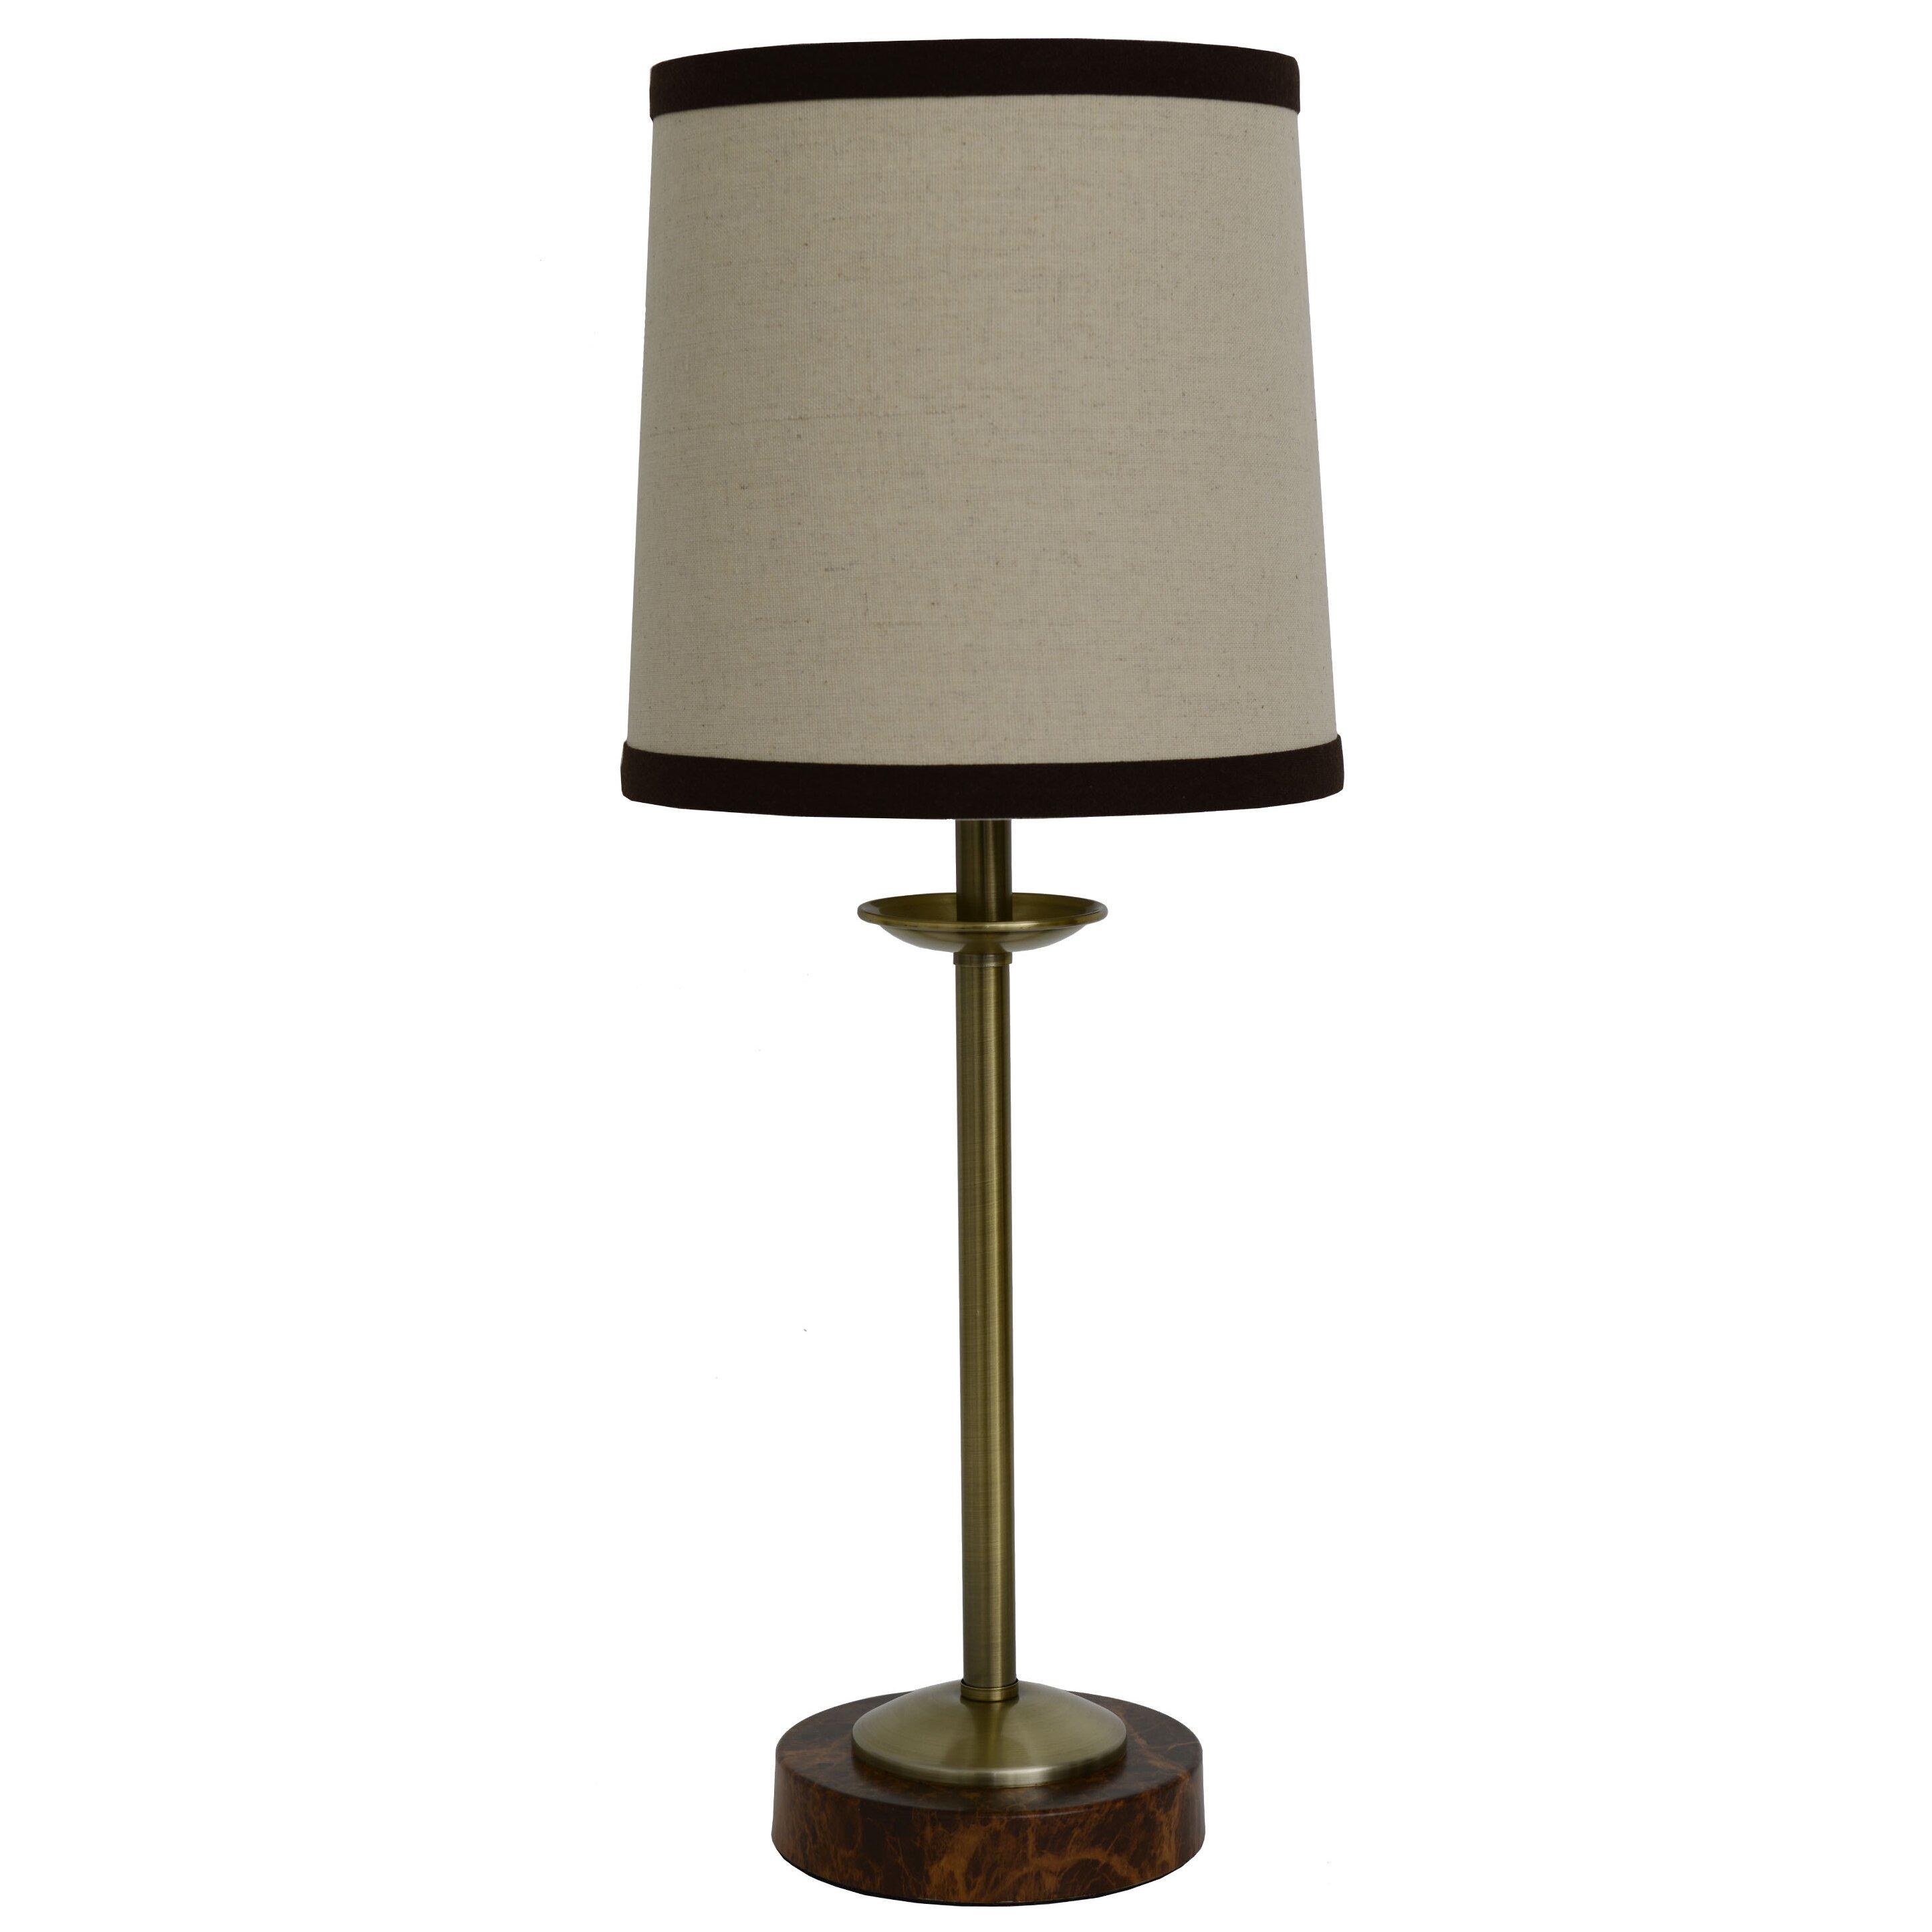 charlton home trafalgar 20 table lamp wayfair. Black Bedroom Furniture Sets. Home Design Ideas